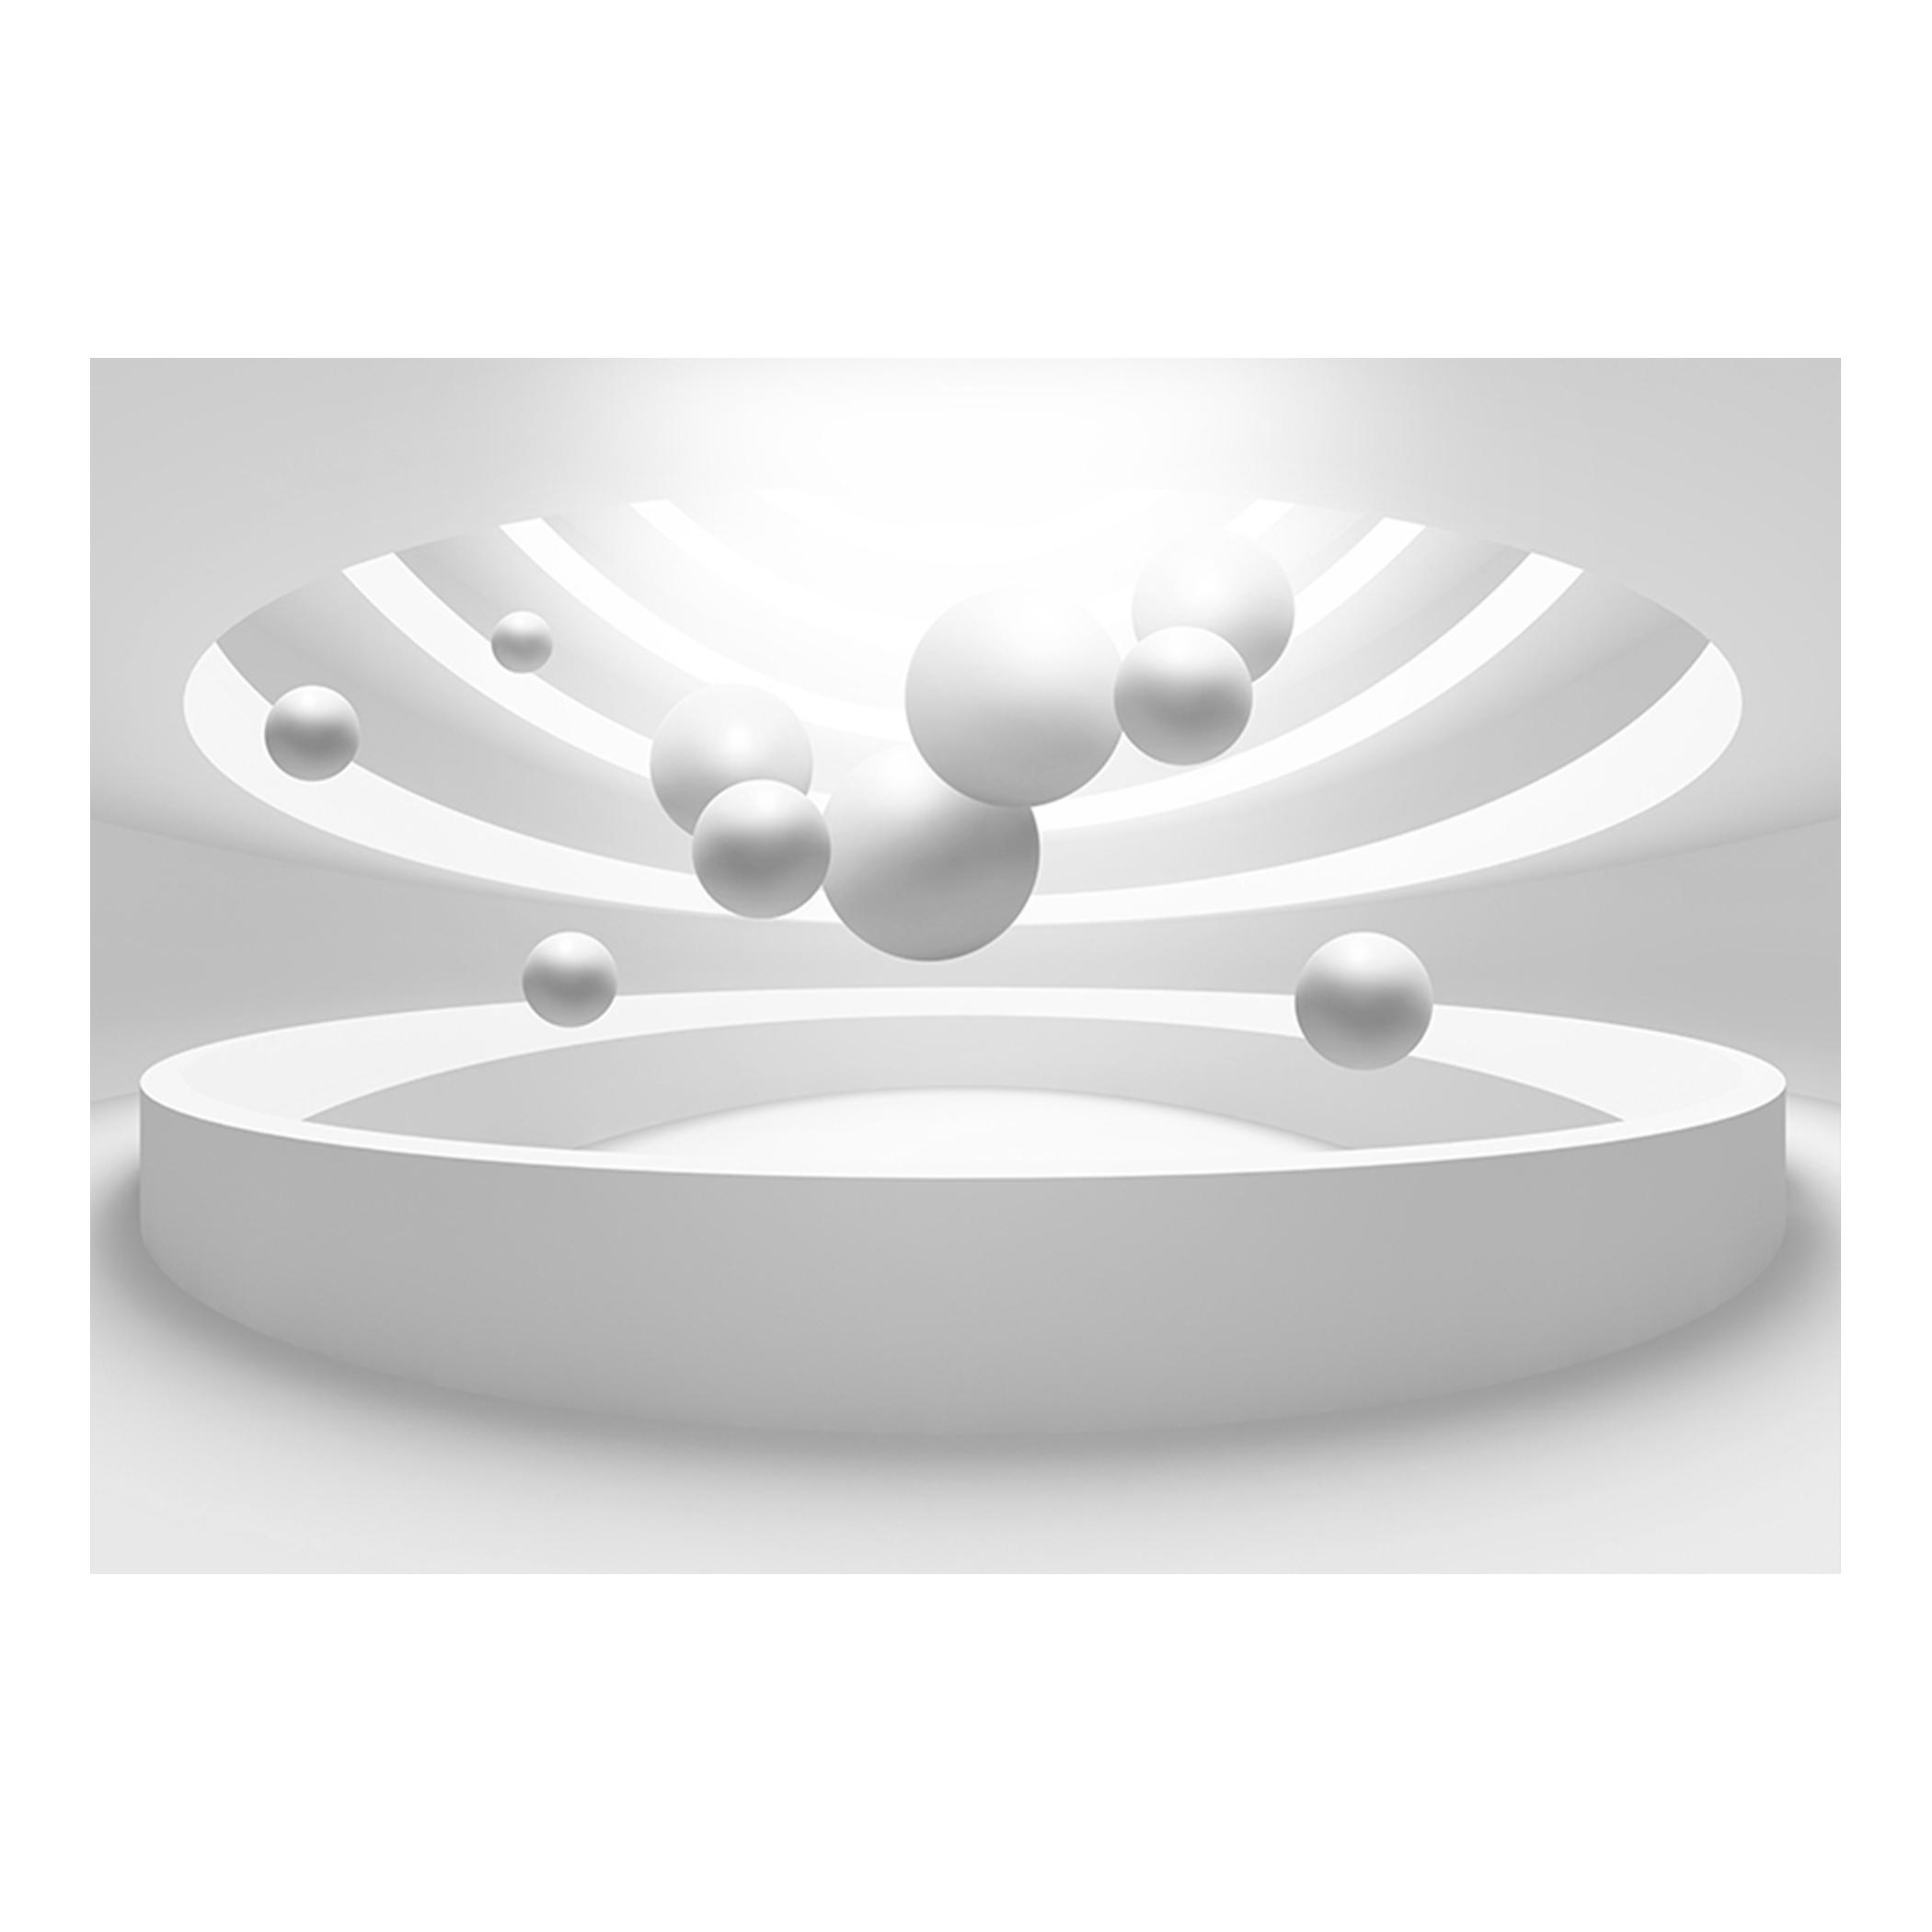 vlies fototapete 3d kugeln tapete tapeten beige wei wandbild xxl gro auswahl ebay. Black Bedroom Furniture Sets. Home Design Ideas